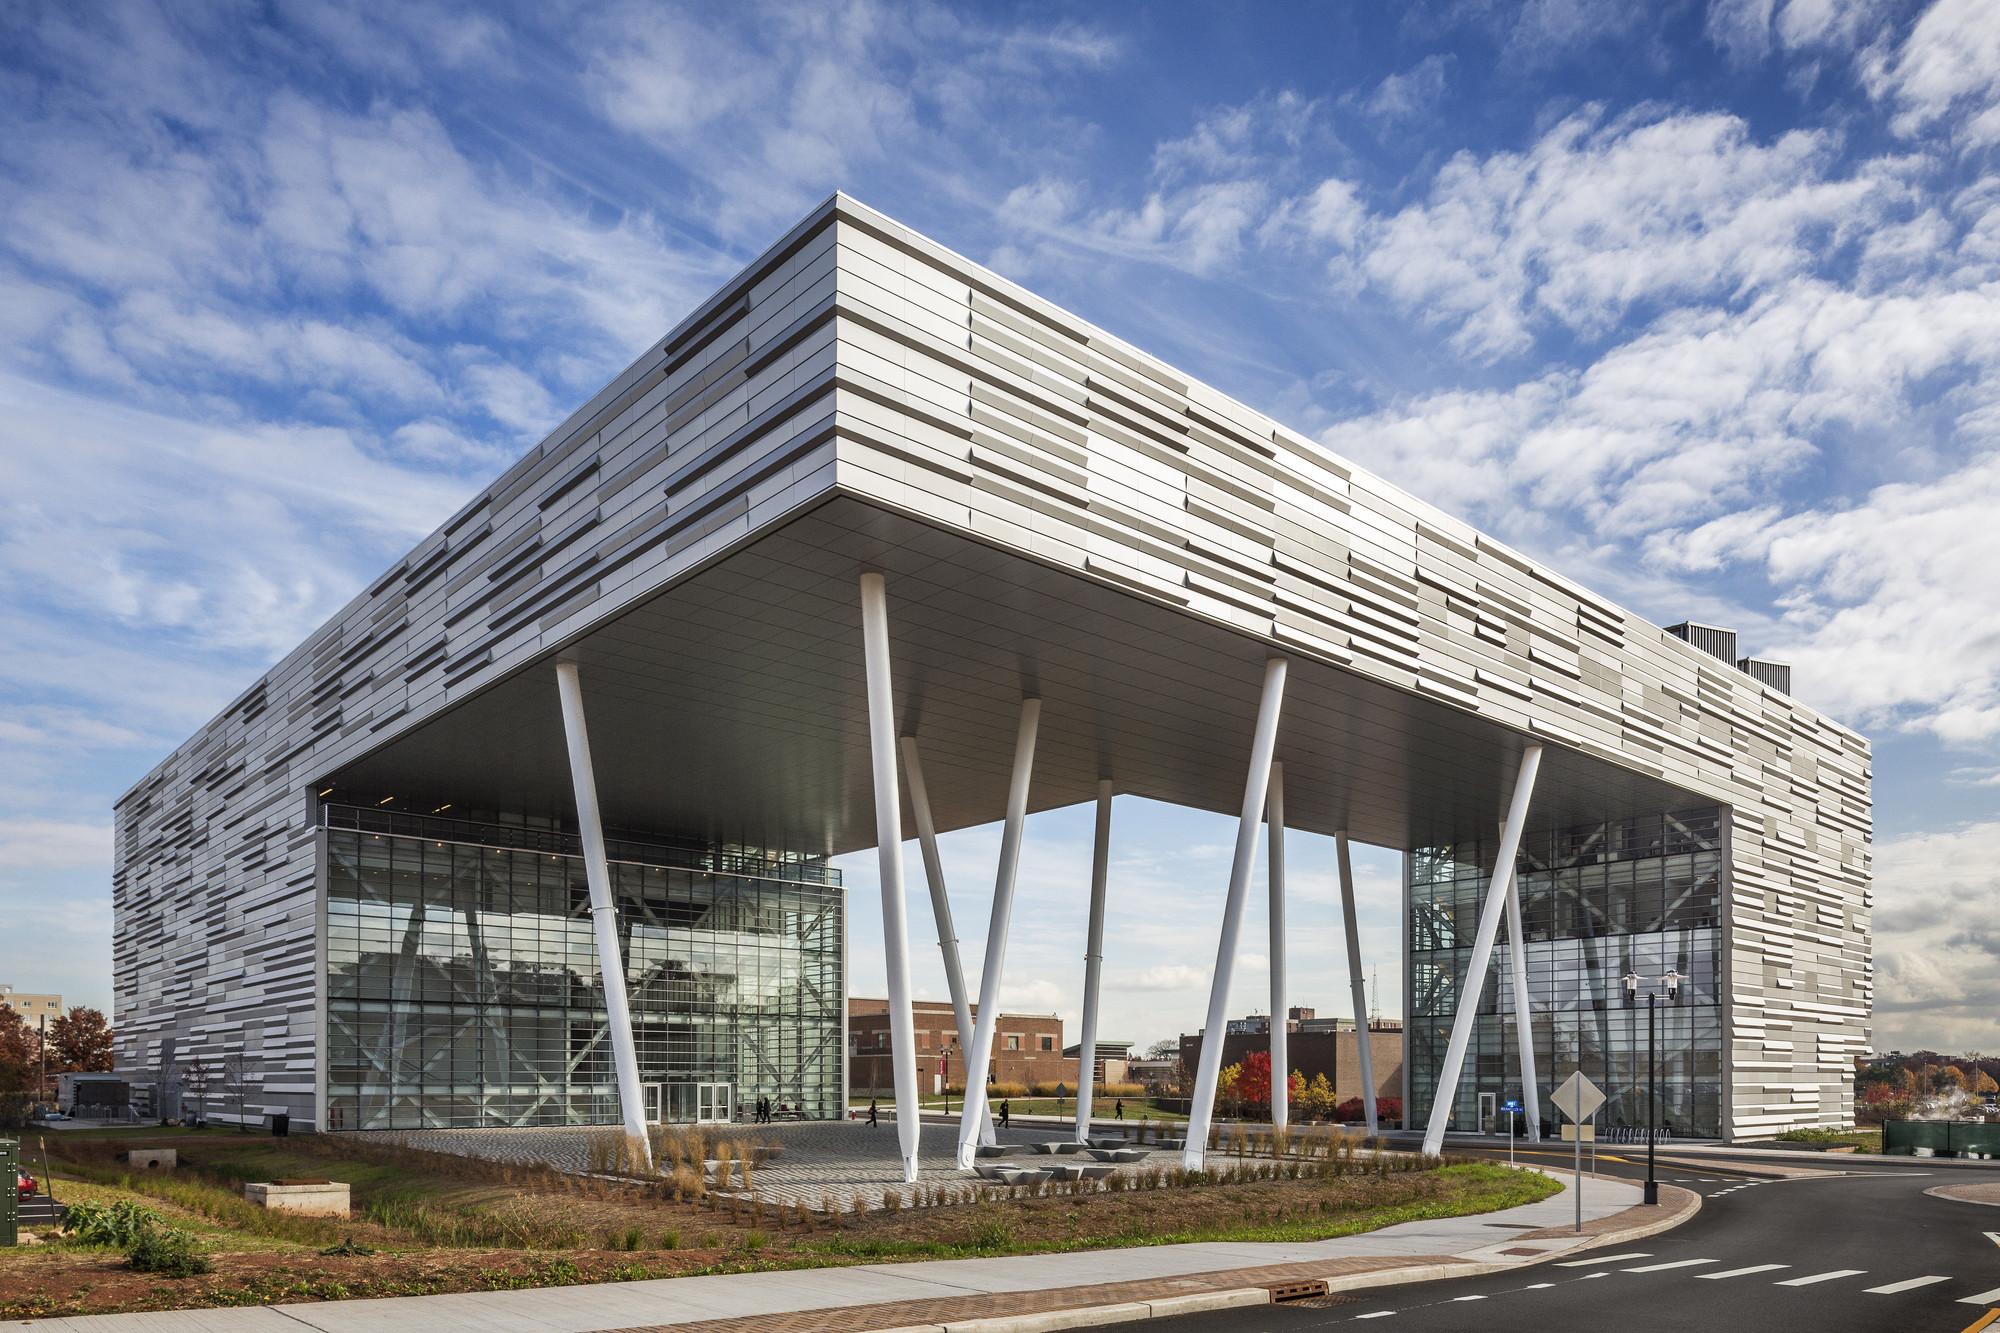 Rutgers Business School, Location: Piscataway NJ, Architect: Enrique Norten, TEN Arquitectos